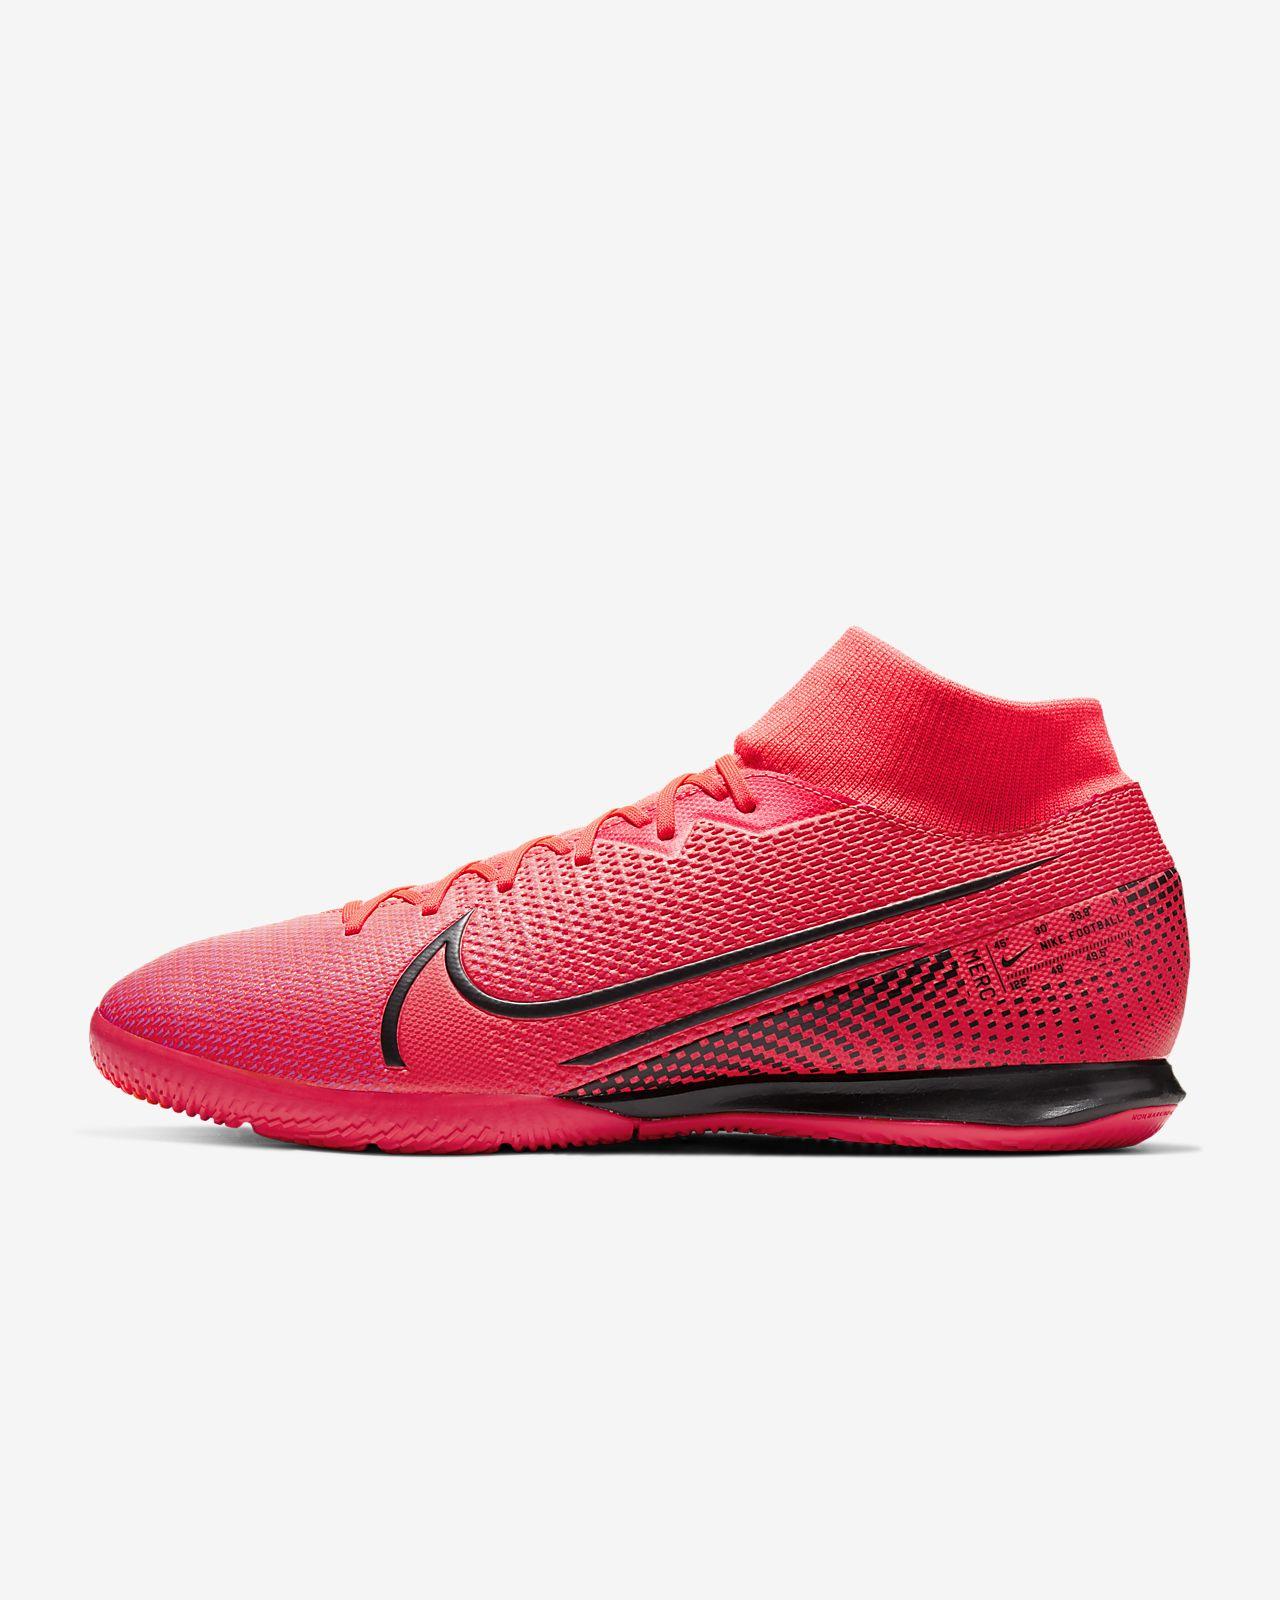 chaussure nike de foot